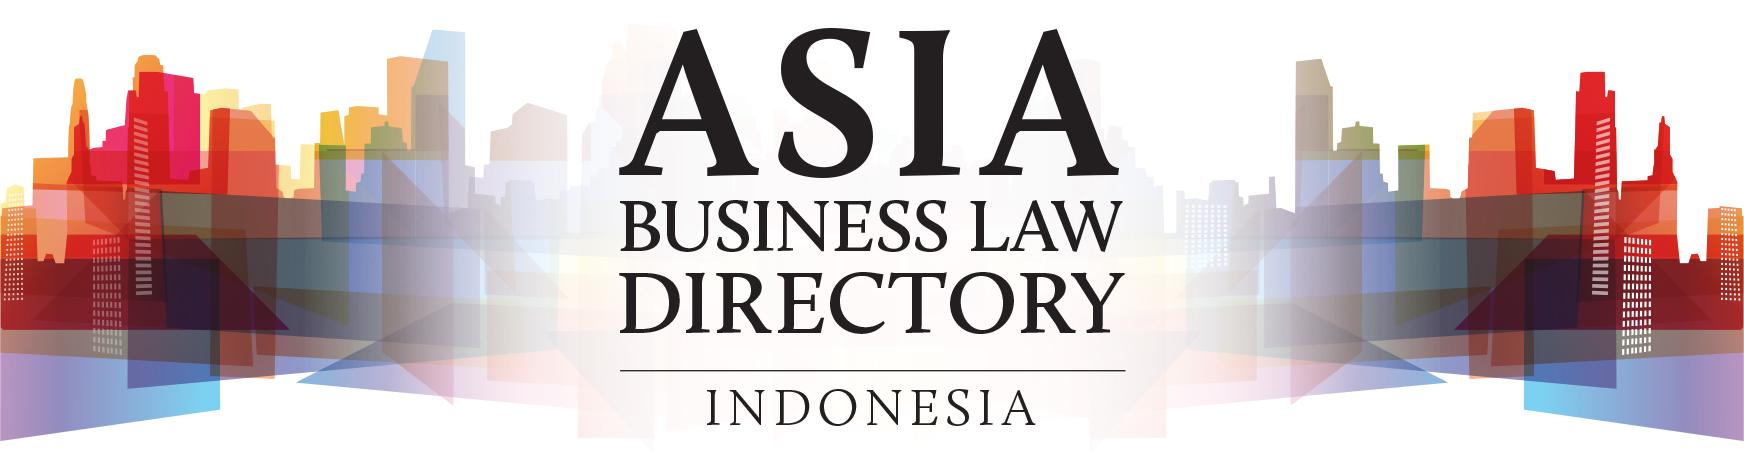 ABLD Indonesia Header